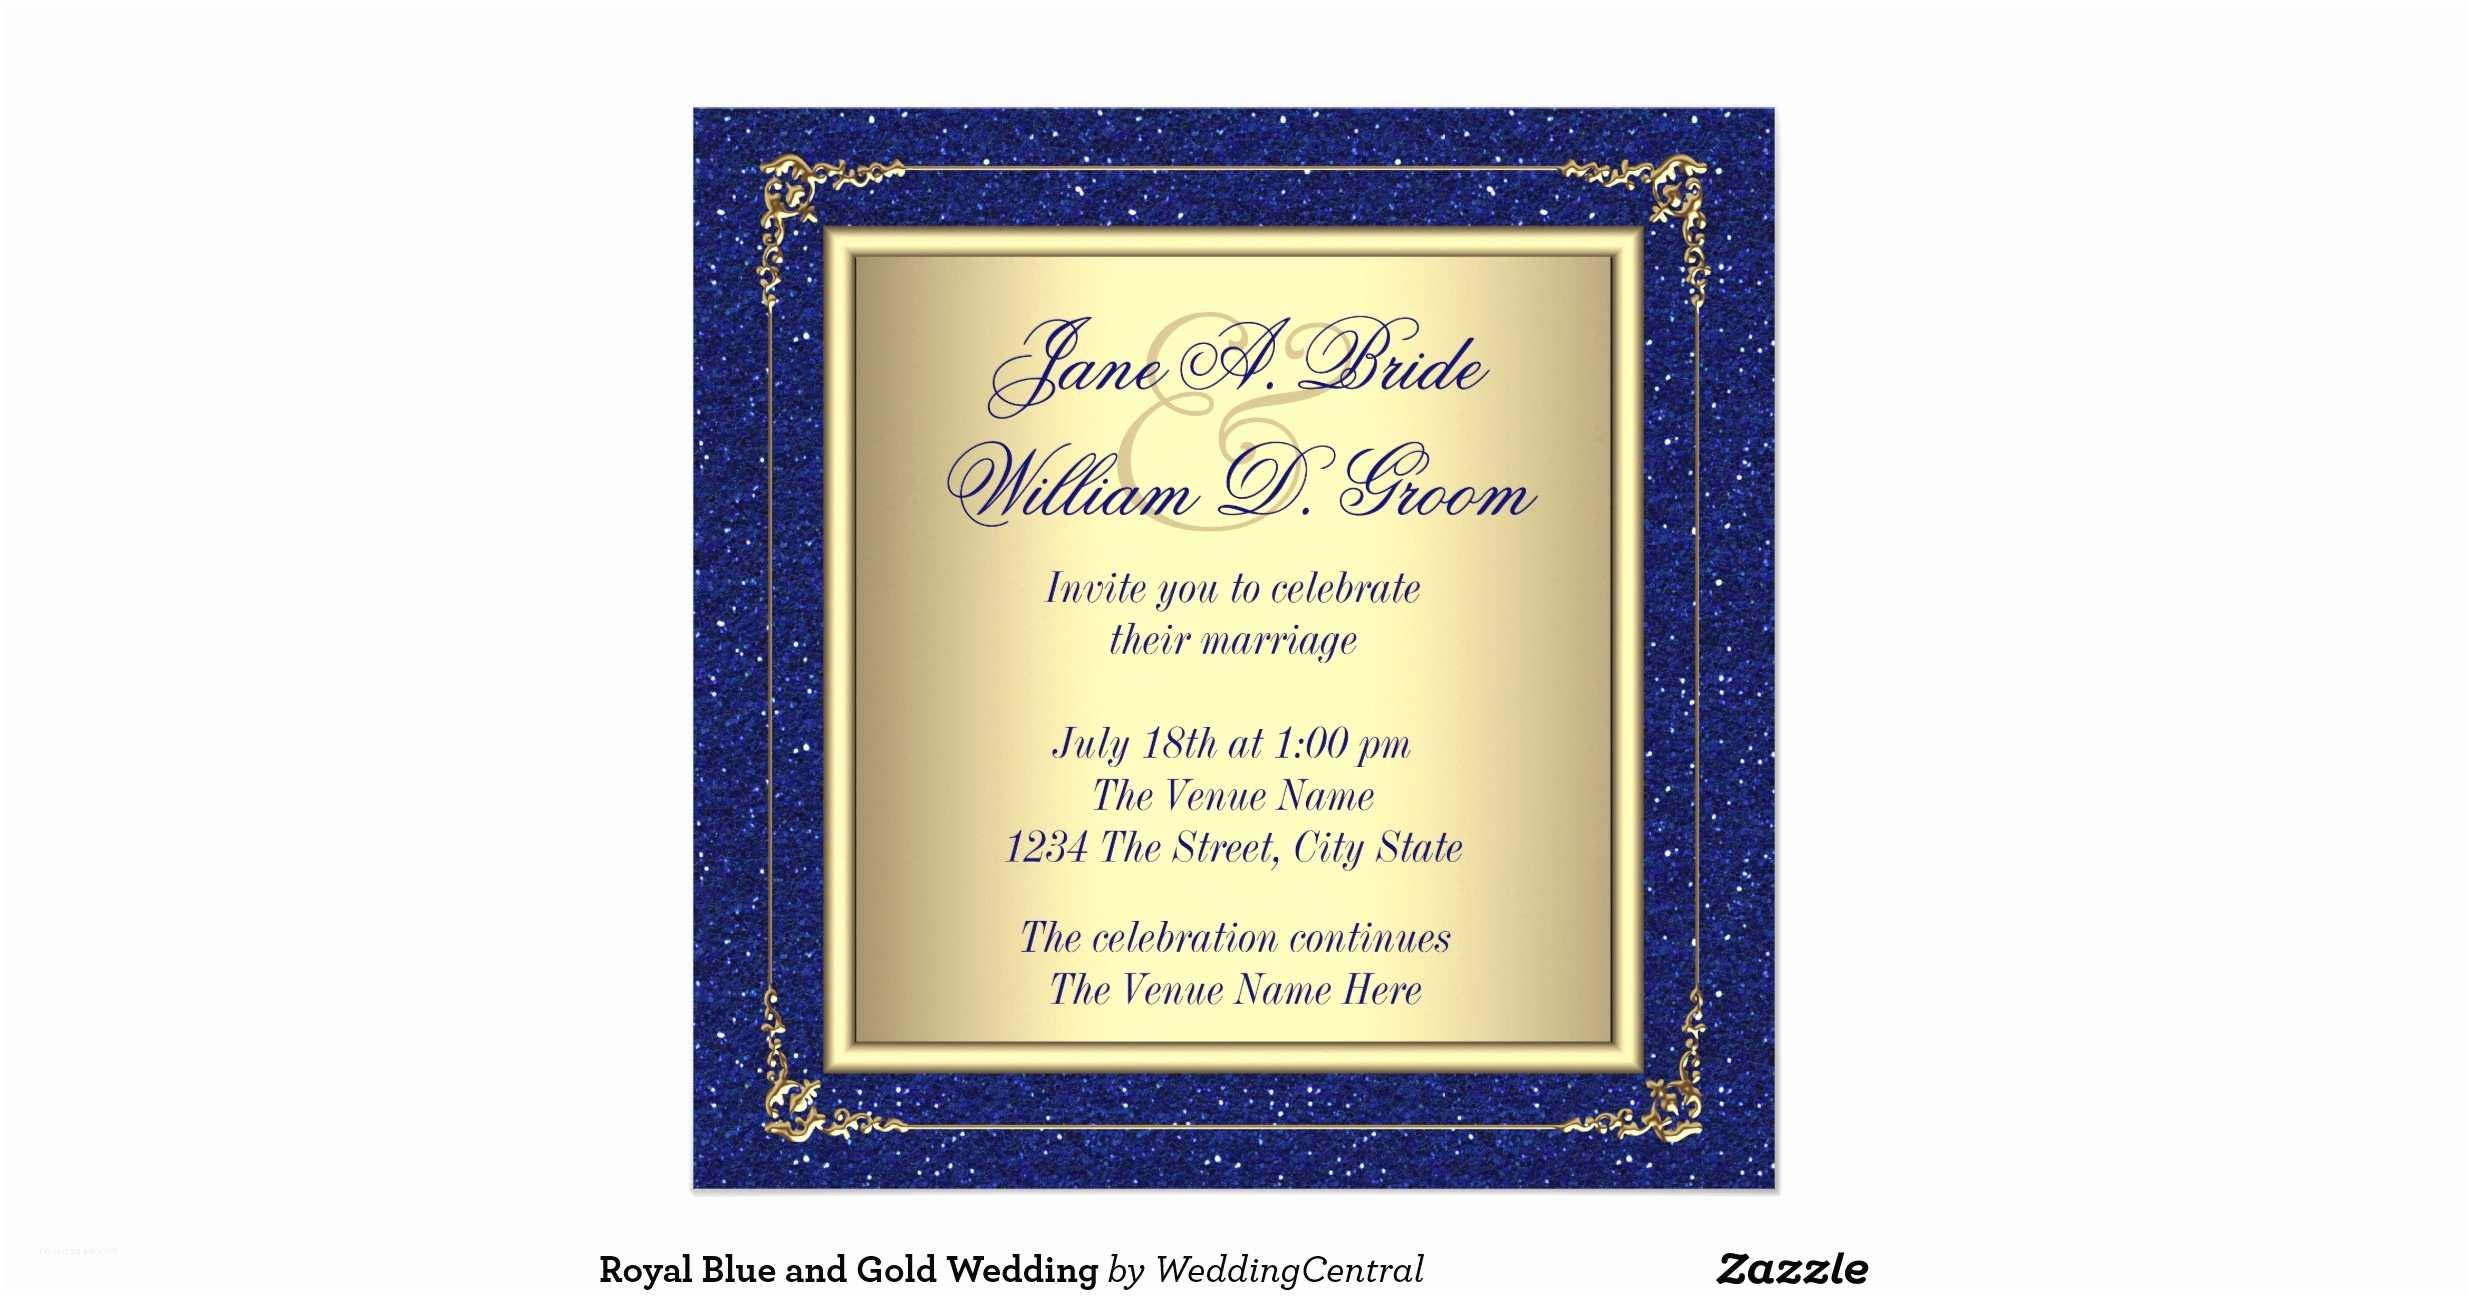 Royal Blue And Gold Wedding Invitations Wedding Invitation Royal Blue And Gold Matik